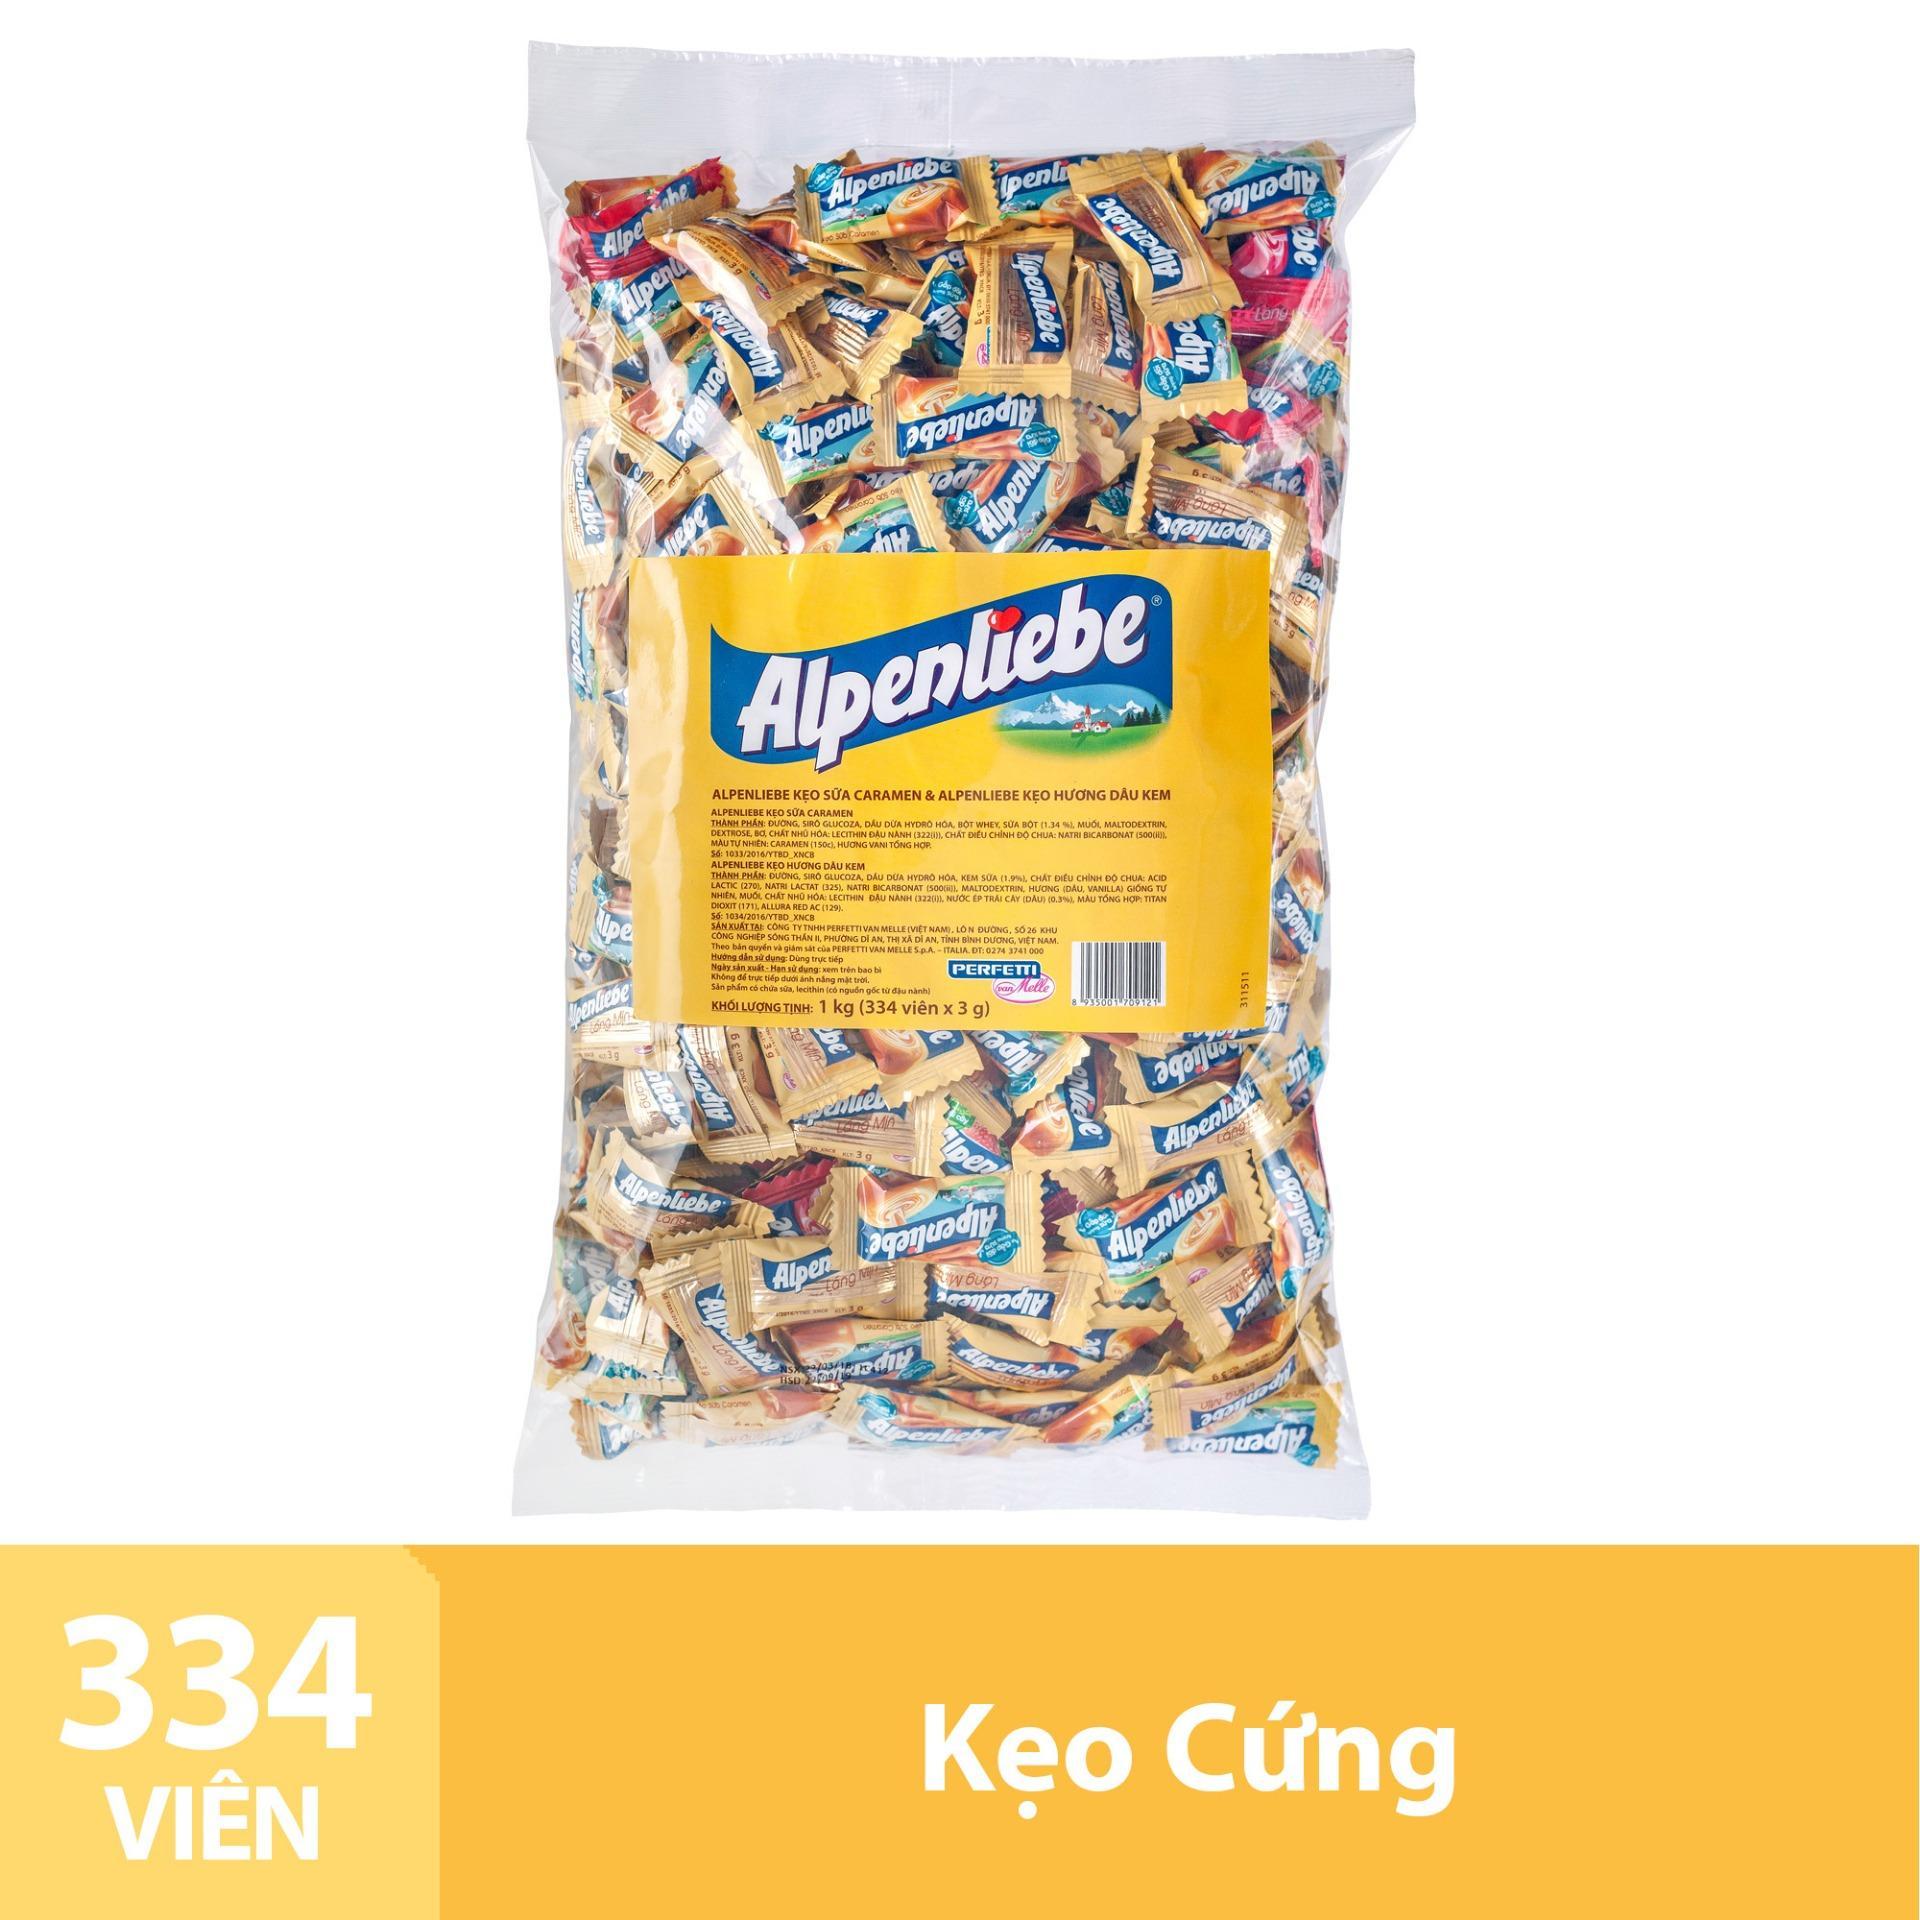 Kẹo Alpenliebe Hương Hỗn Hợp Dâu Kem & Caramen Gói 1Kg Nhật Bản